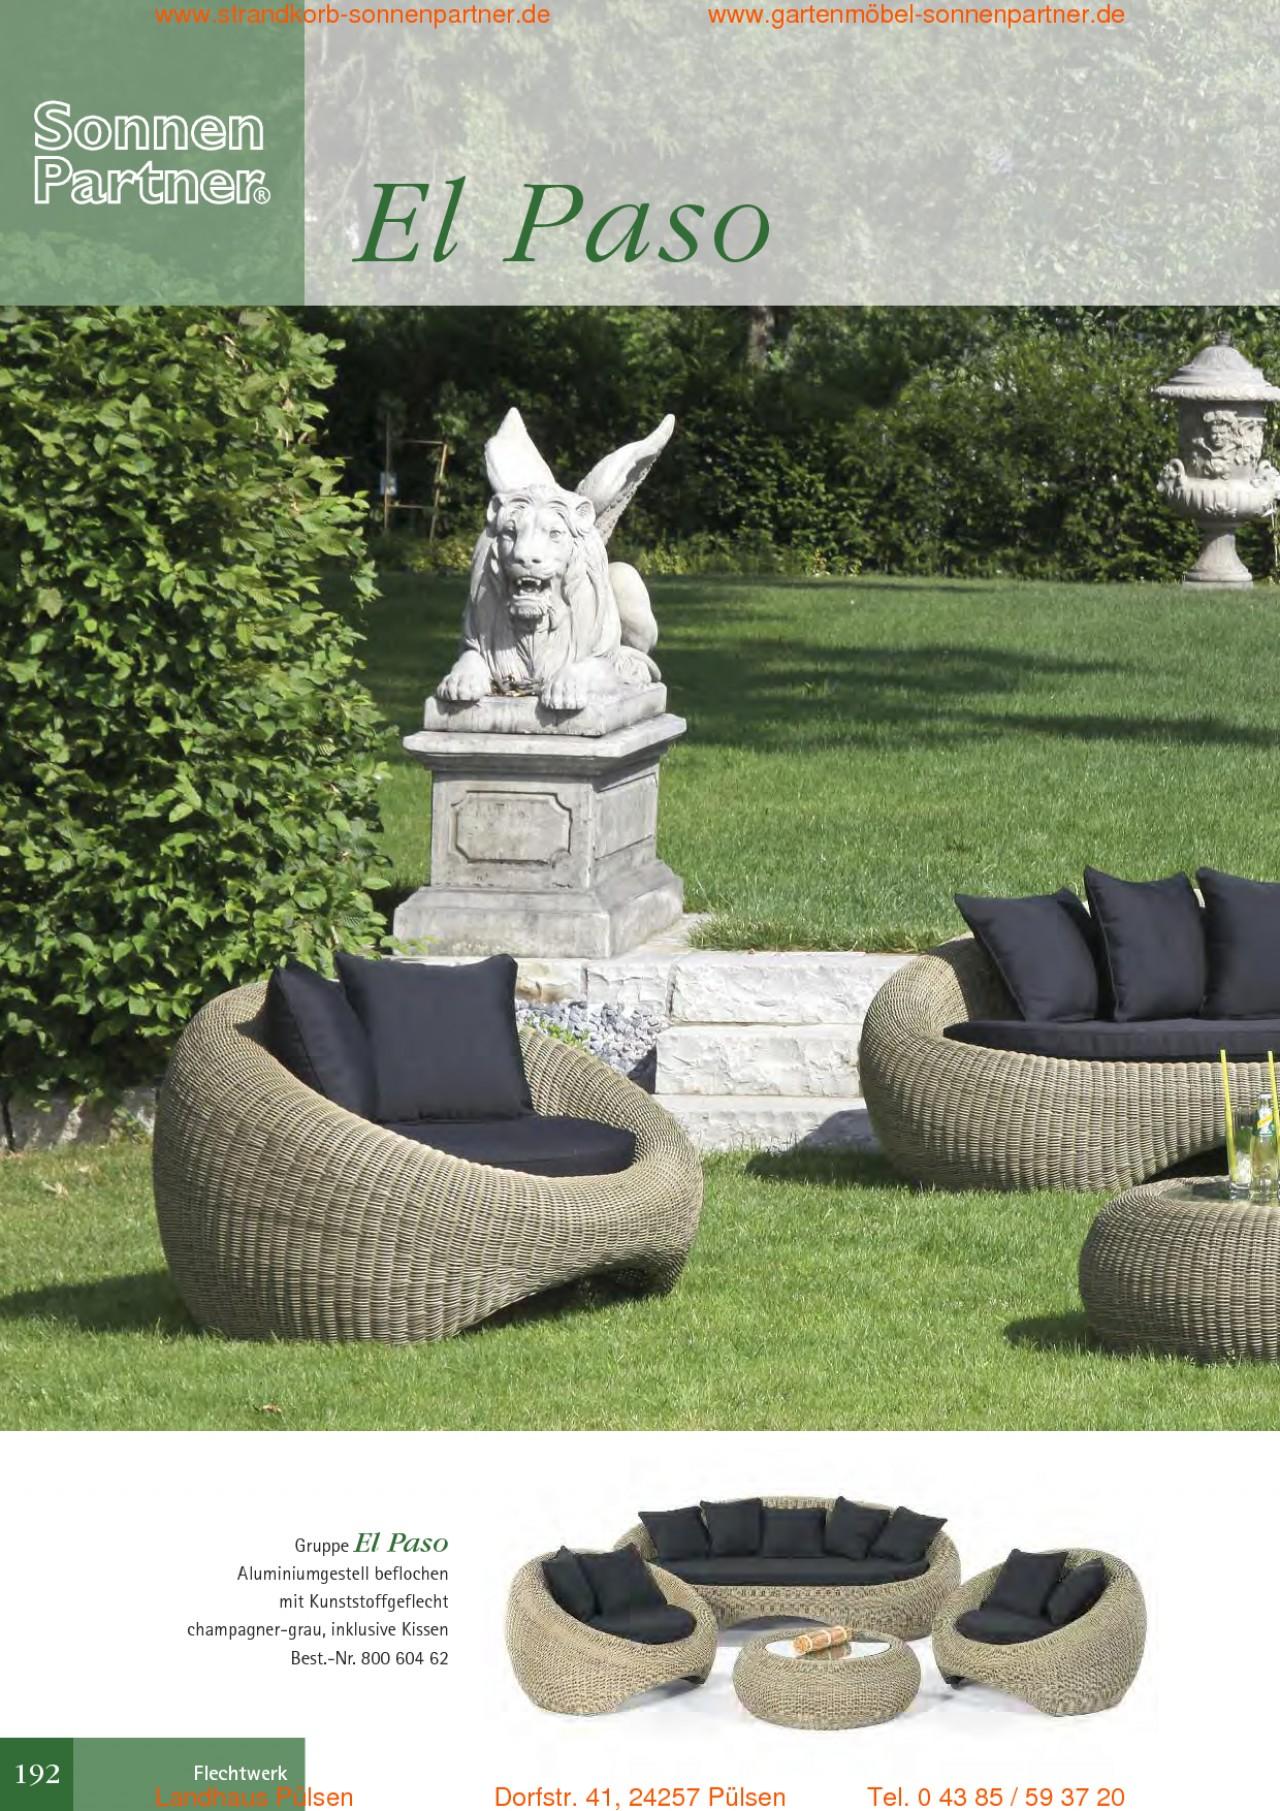 sonnenpartner gartenmoebel strandkoerbe 2011 1 seite 192. Black Bedroom Furniture Sets. Home Design Ideas